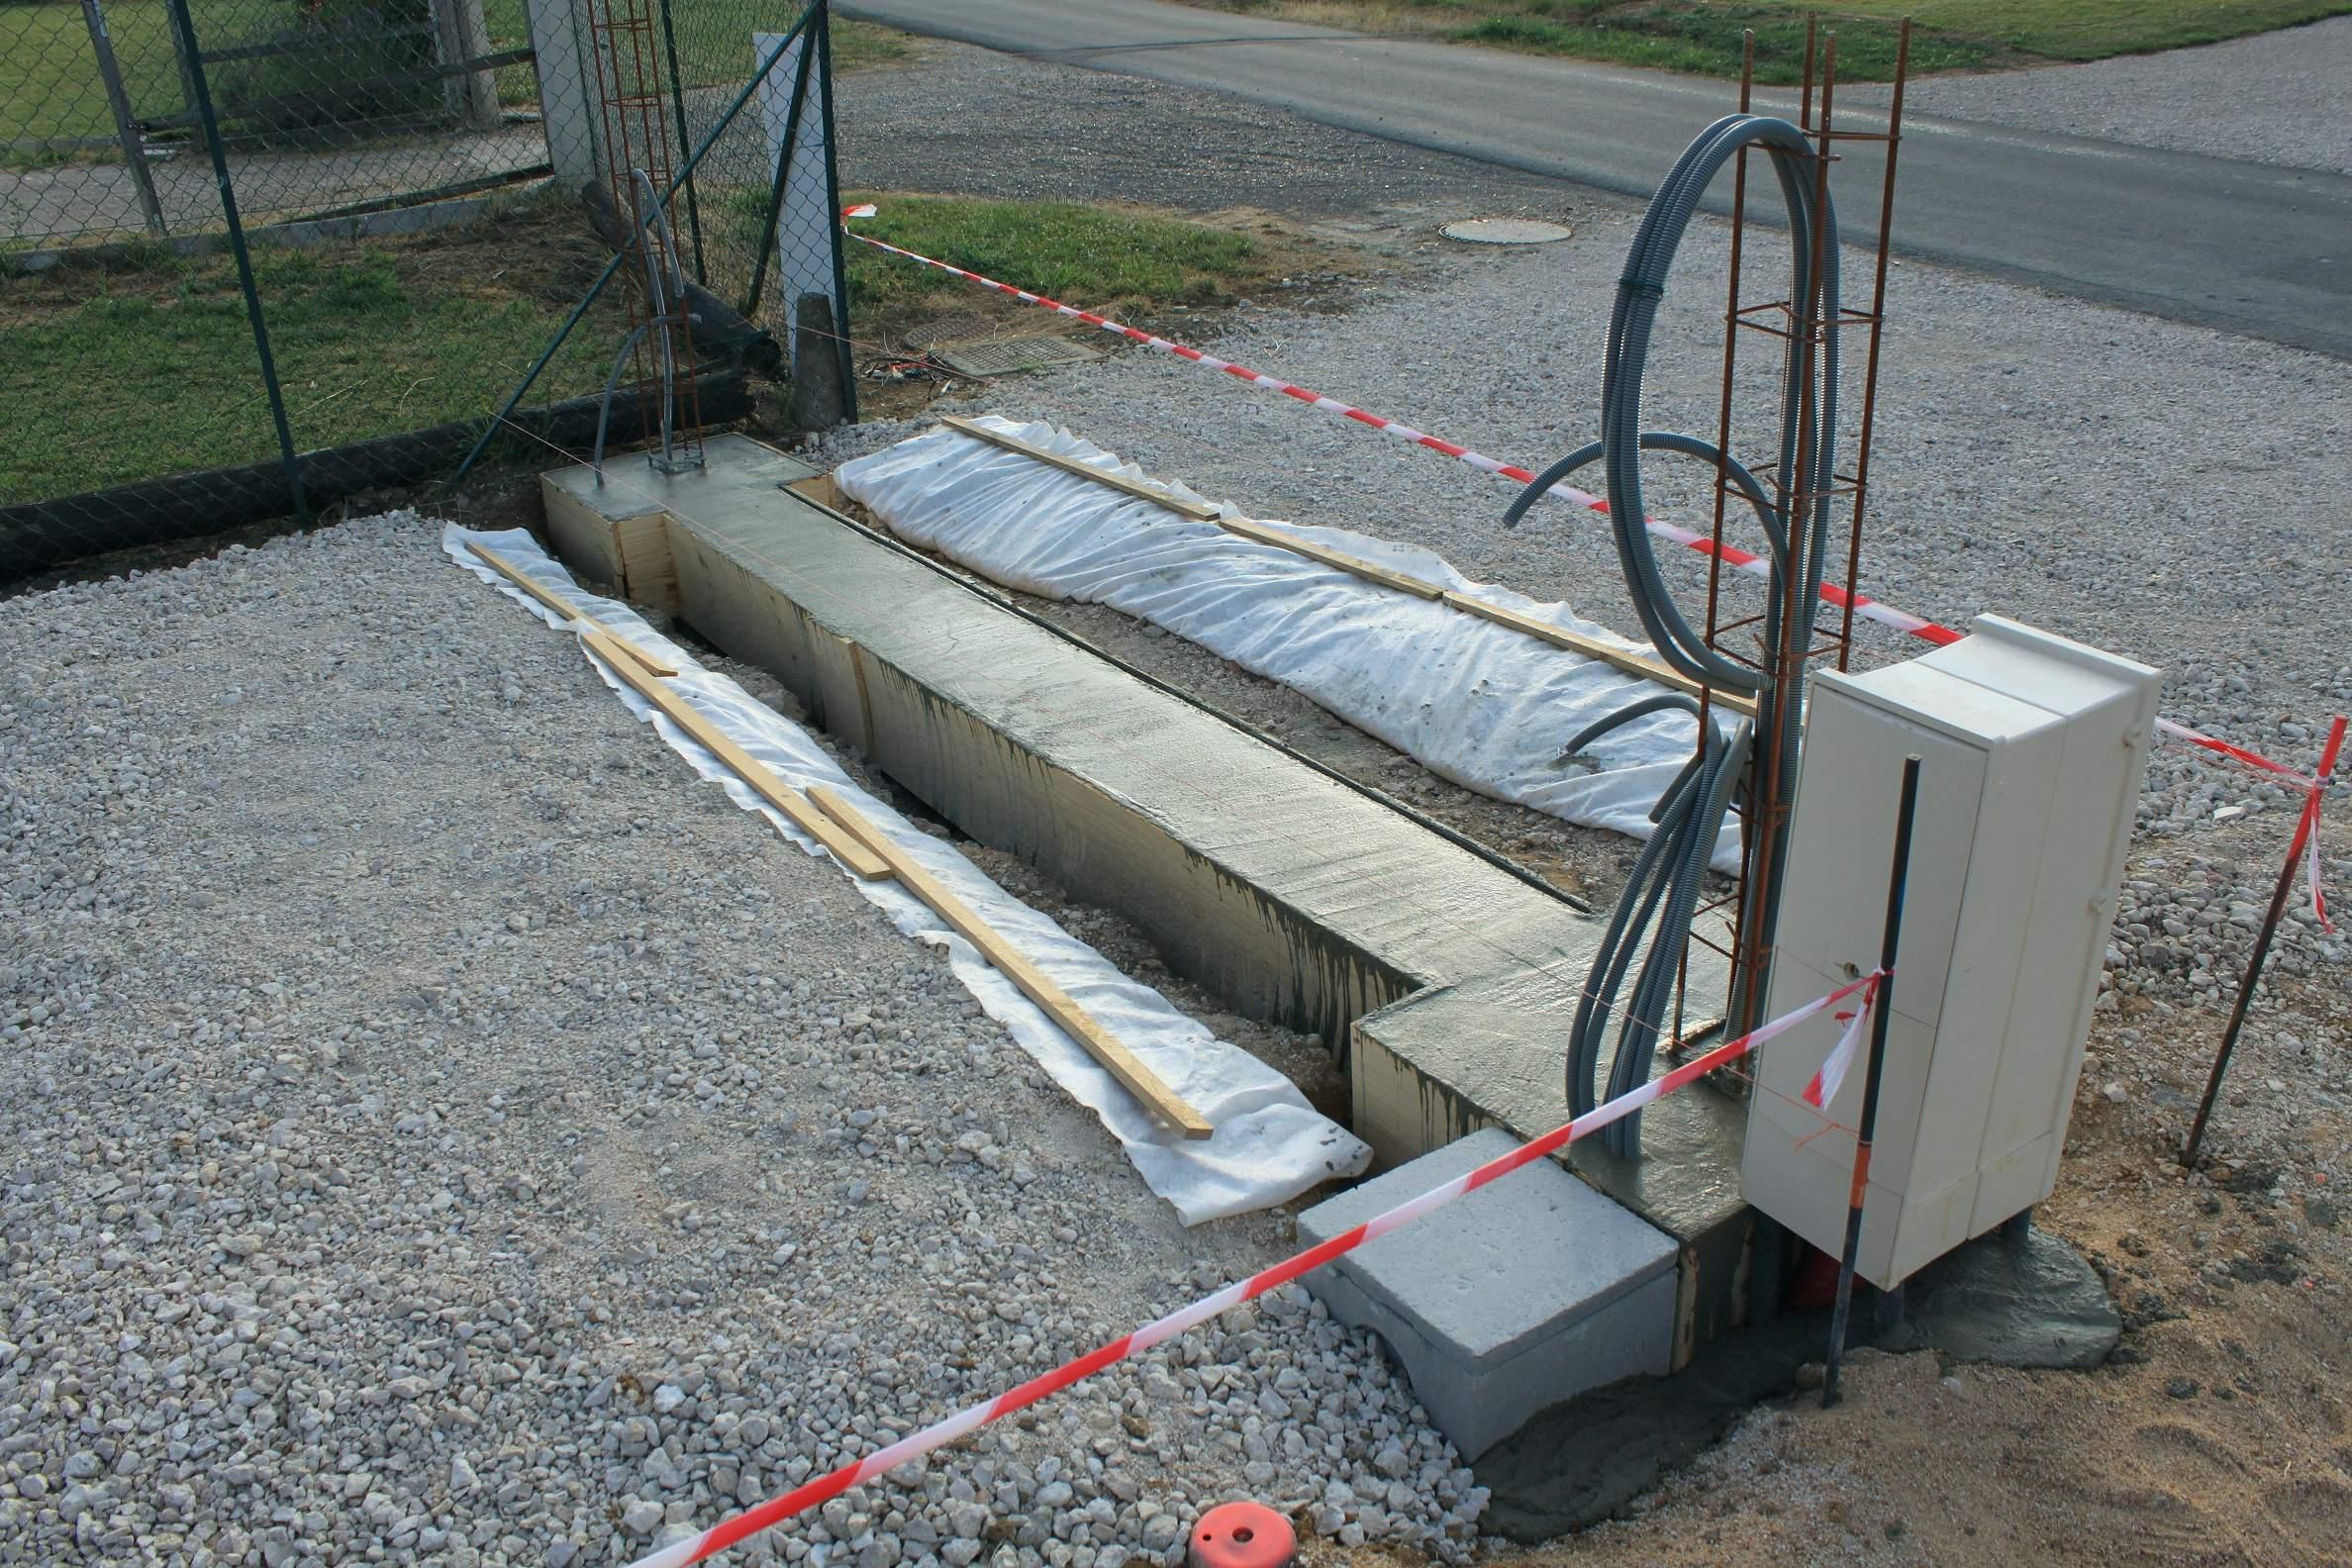 Beau Jardin Moderne Meilleur De Photographie Kb Jardin Moderne Brico Depot Abri De Jardin Luxe Garage Le Moins